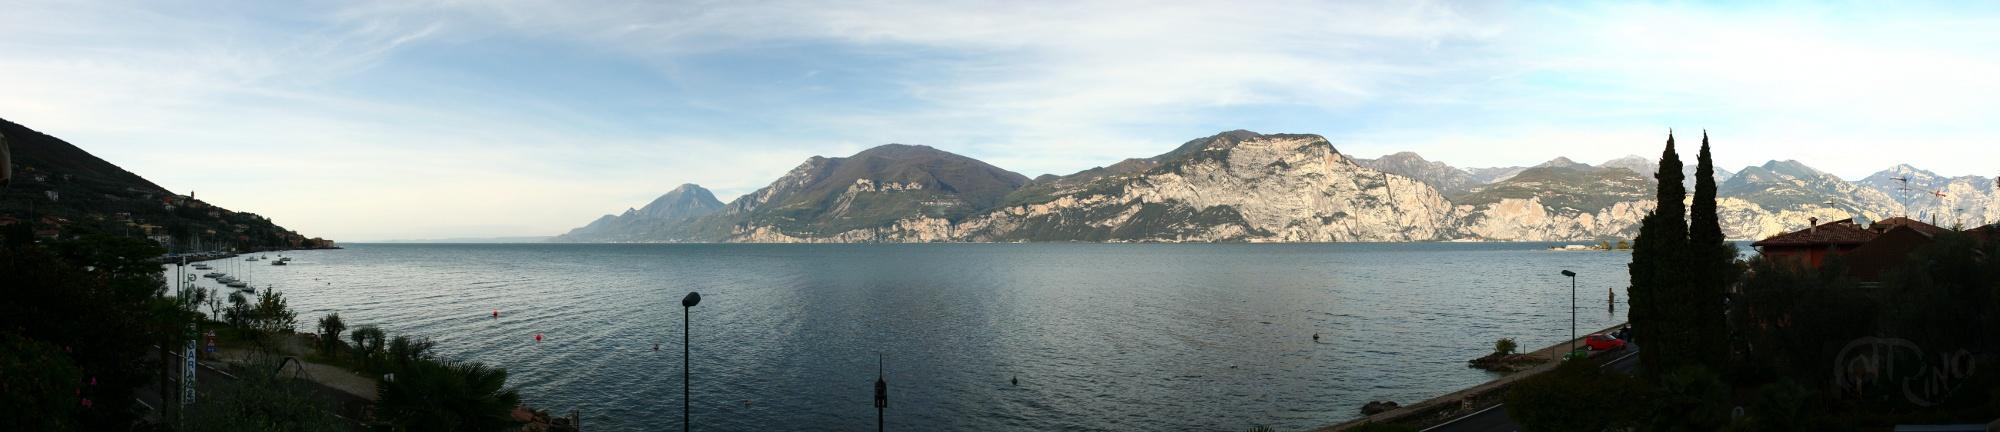 Brenzone - Lago di Garda